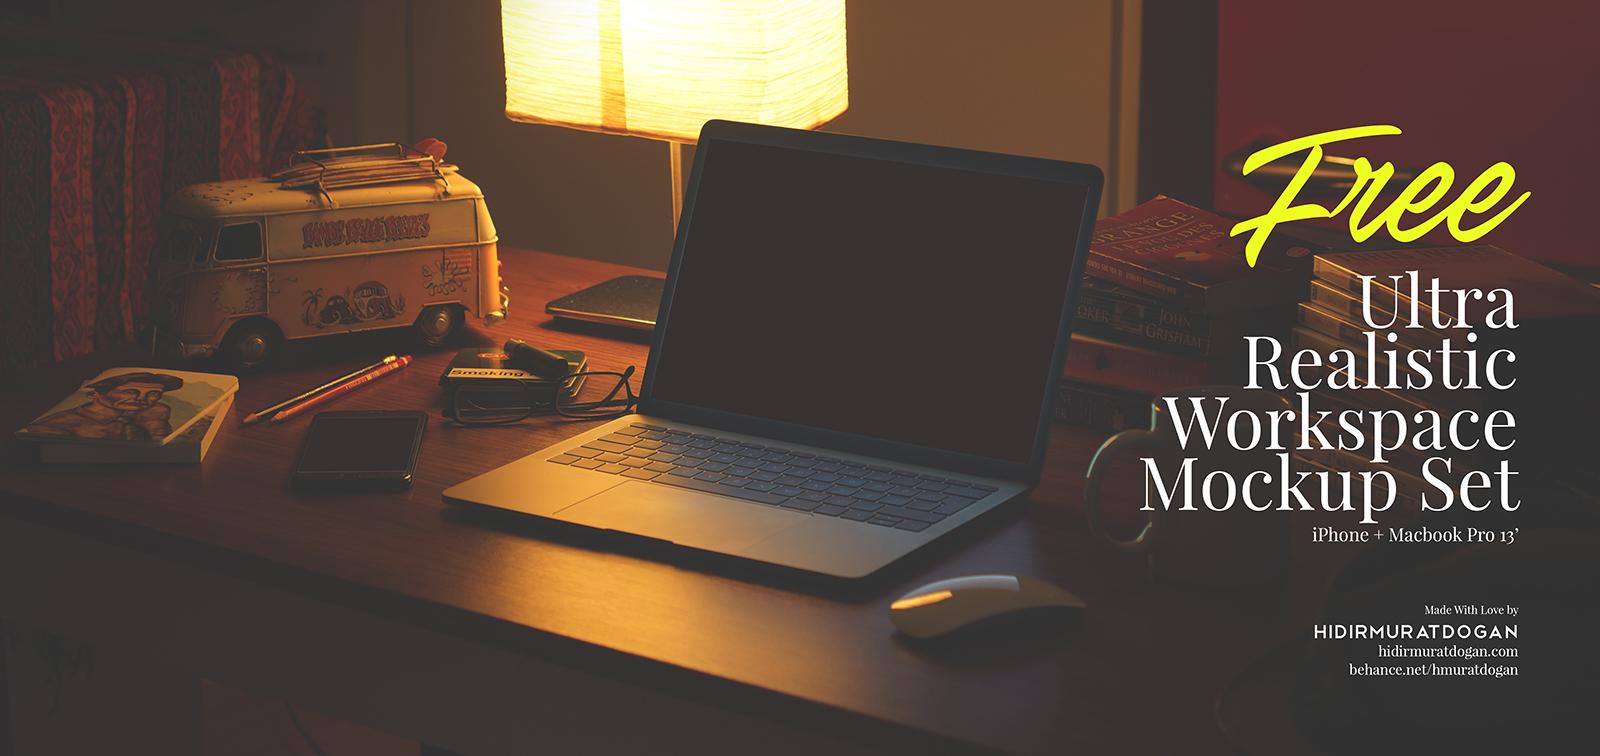 13 Ultra Realistic Mockups - Free Workspace Mockup Set